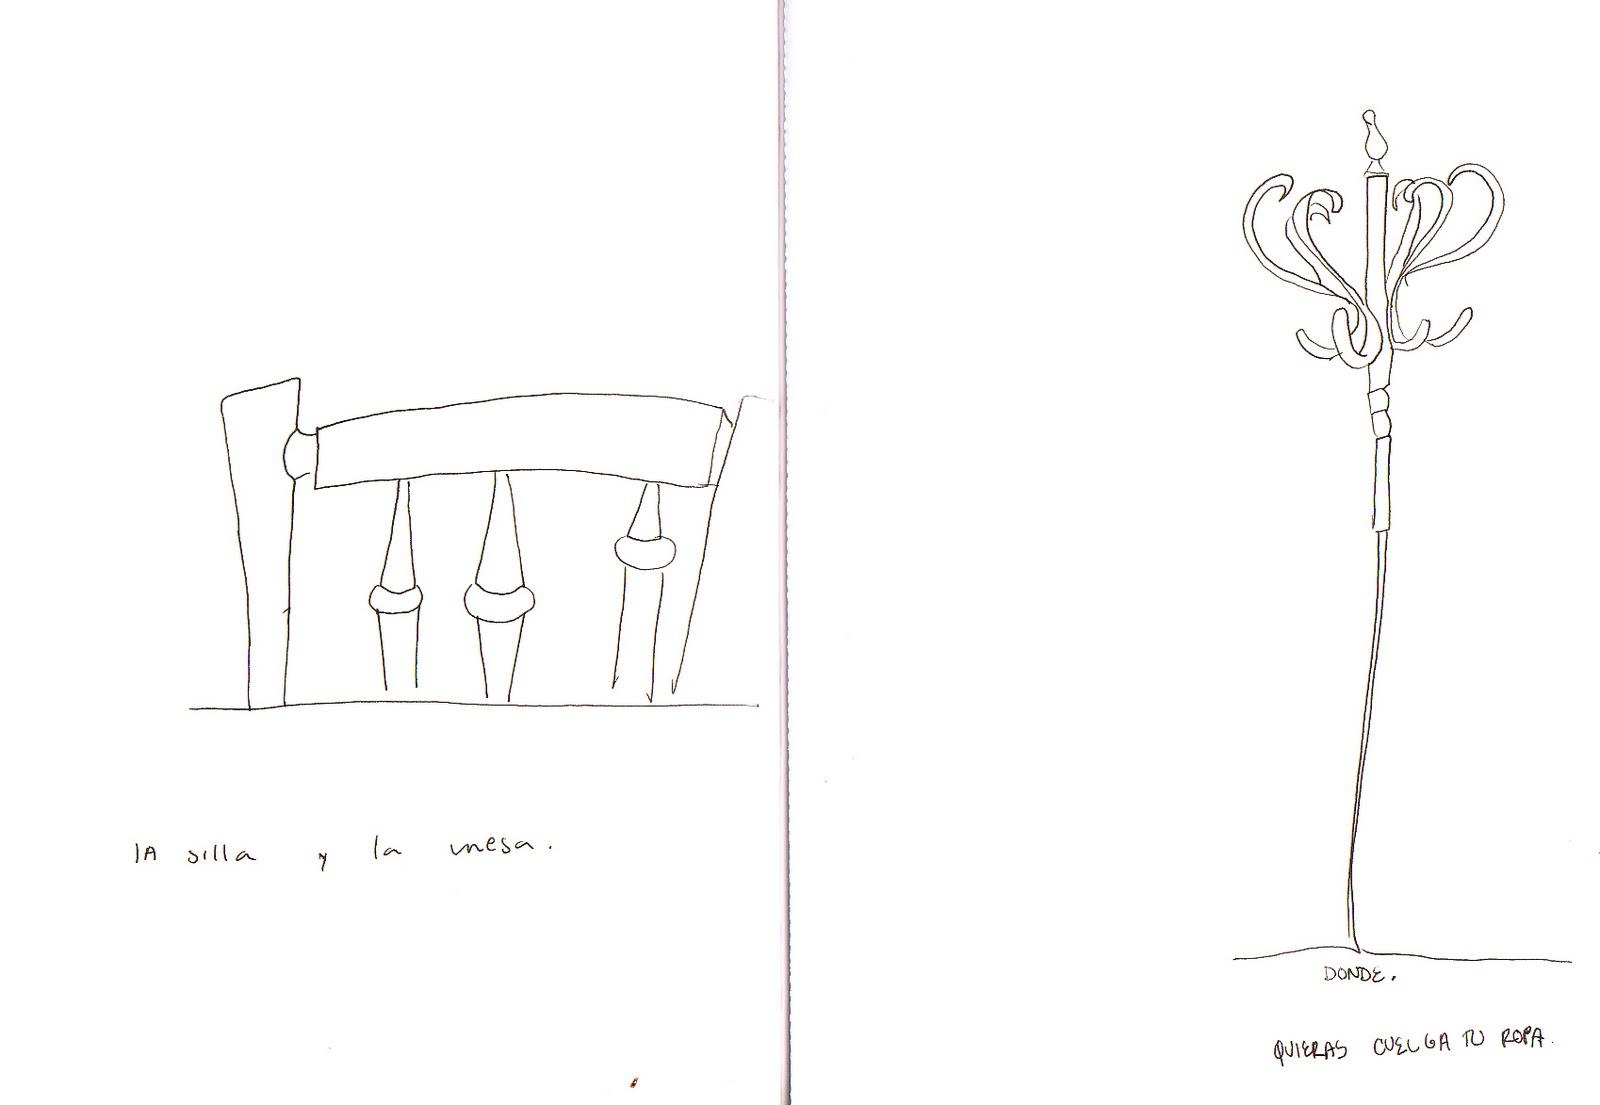 Gabriela-Sanchez-Drawing9.jpg